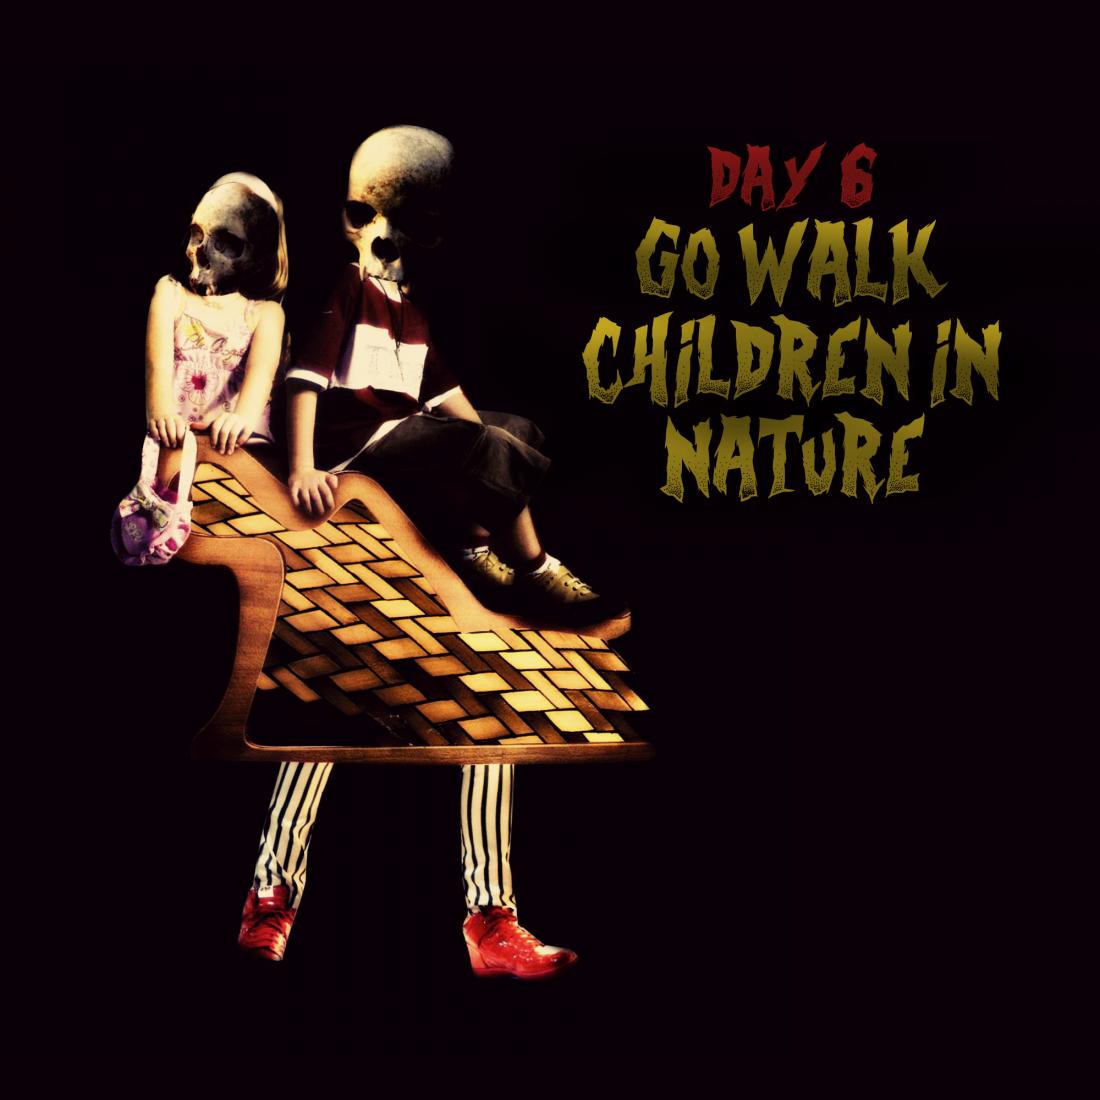 drawlloween-6-go-walk-children-in-nature